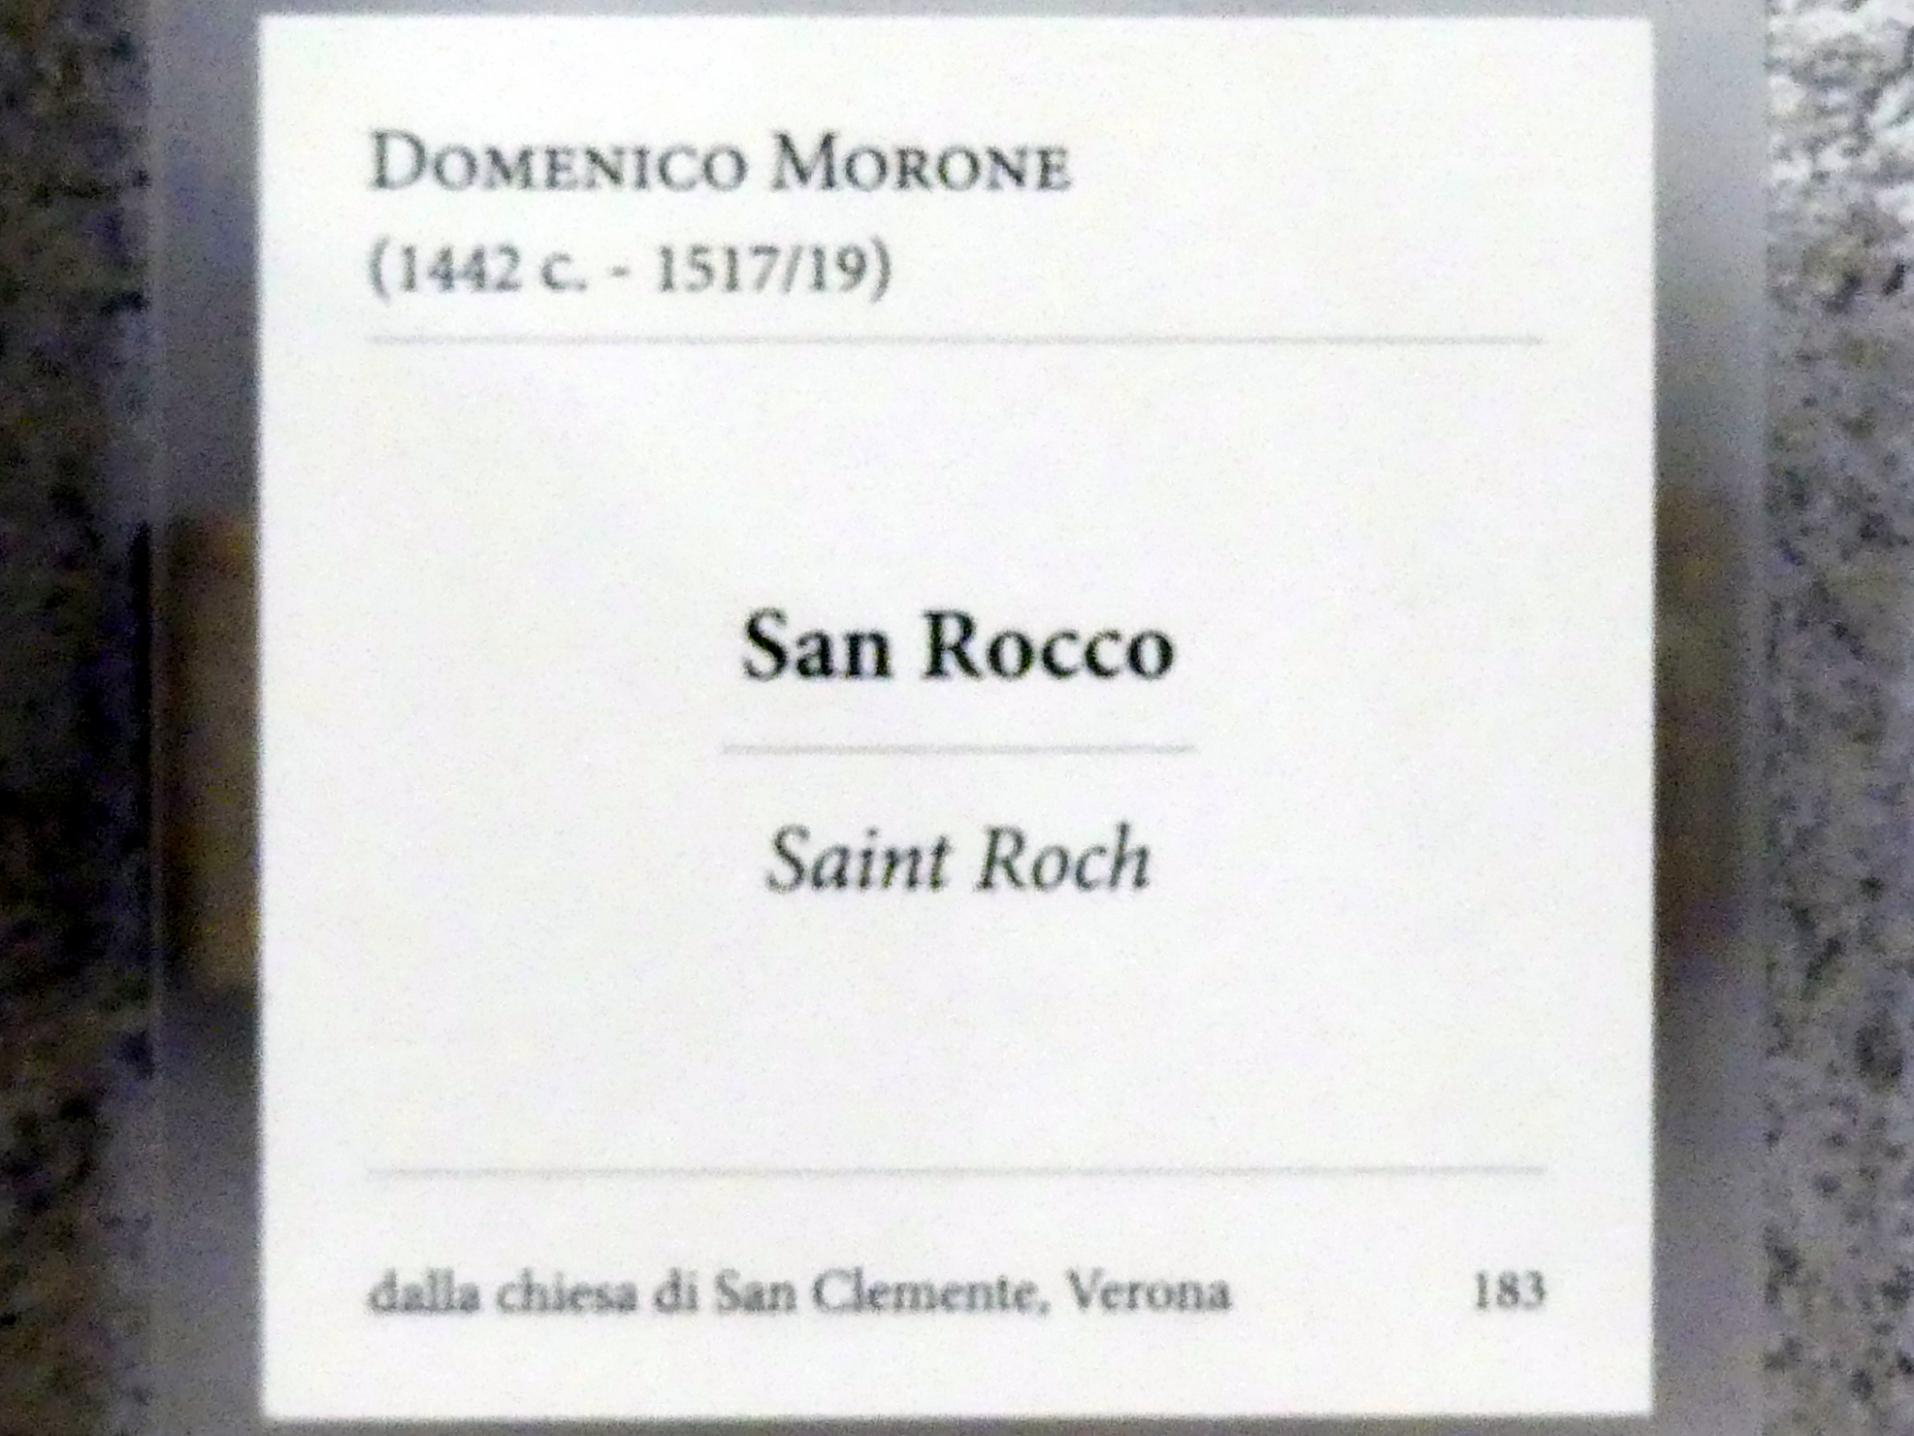 Domenico Morone: Heiliger Rochus, Undatiert, Bild 2/2